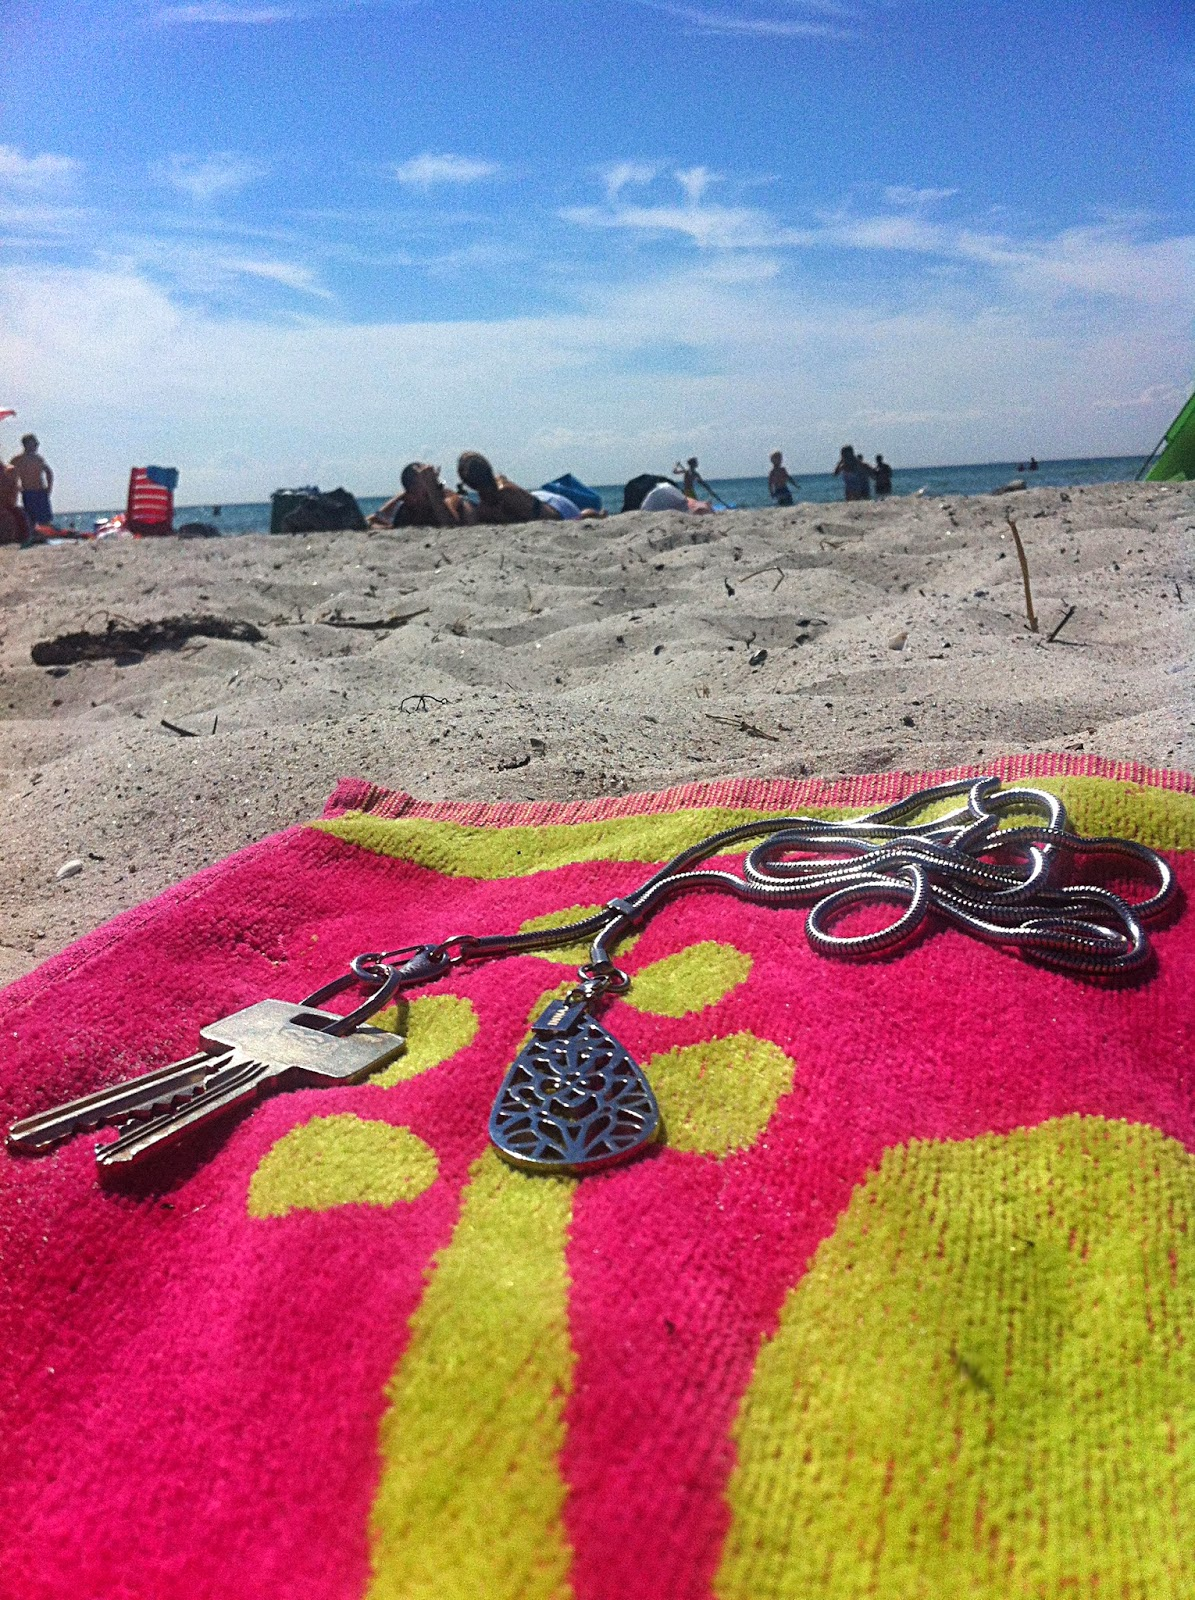 Key chain for the beach